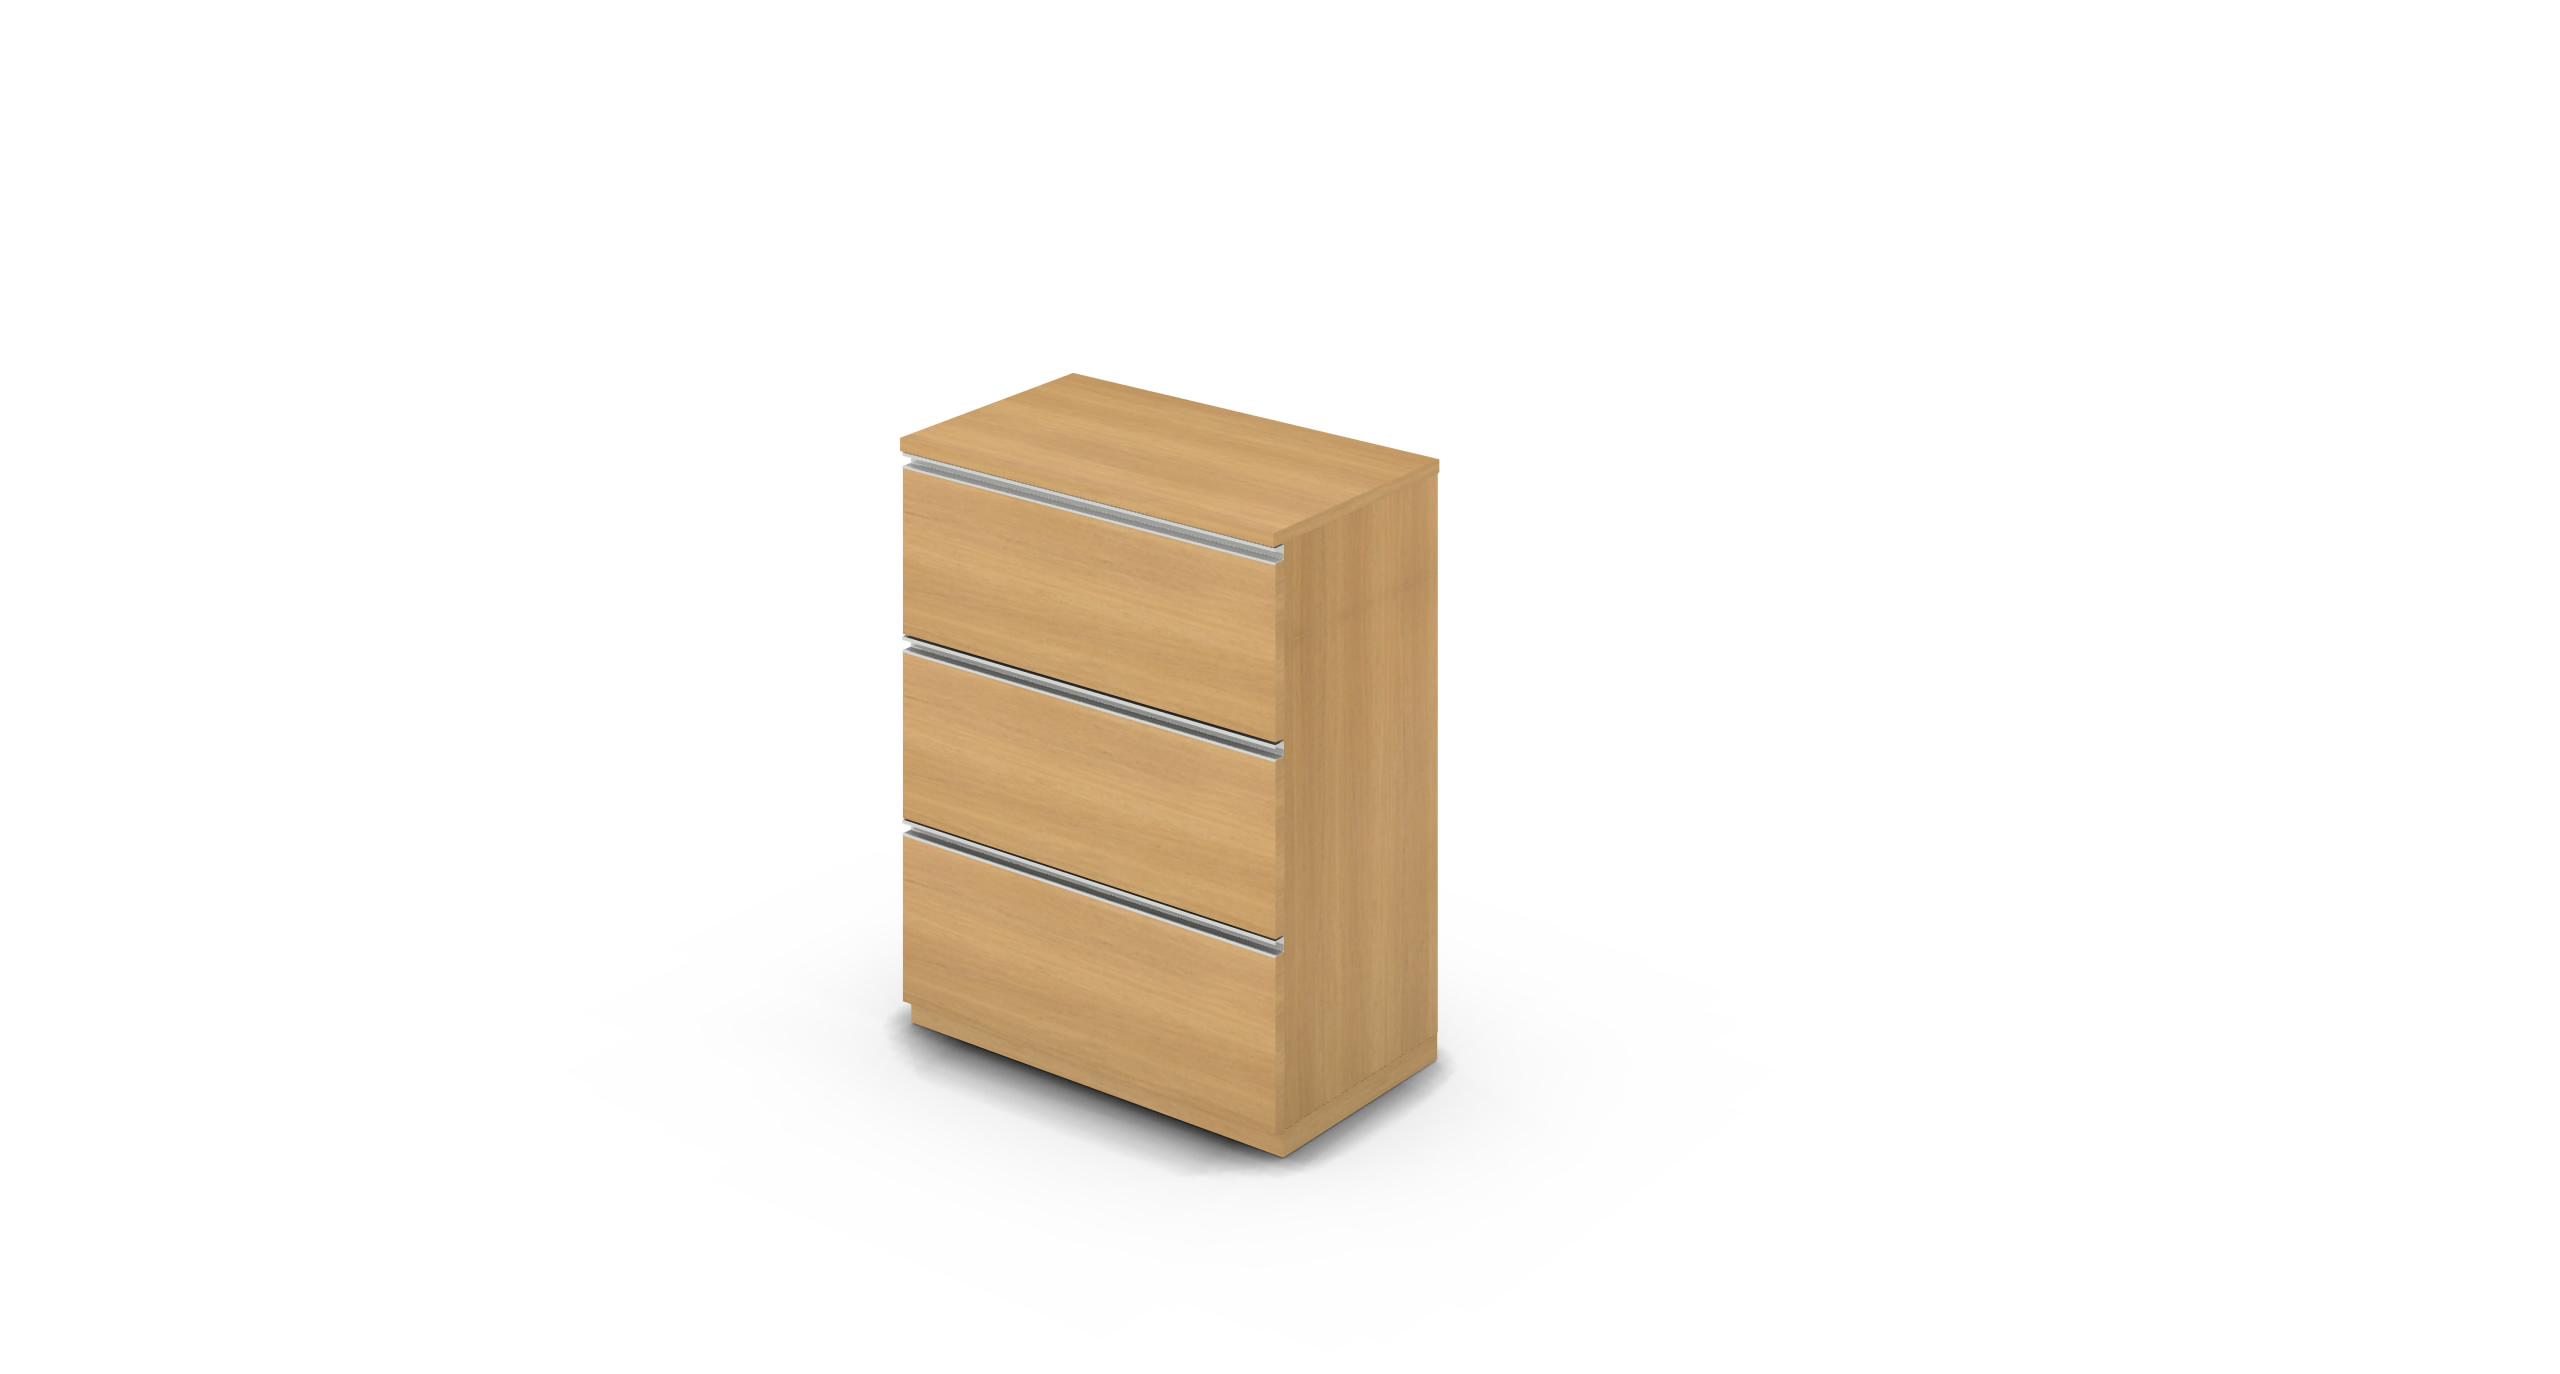 Cabinet_800x450x1125_DR_Oak_Rail_NoCylinder